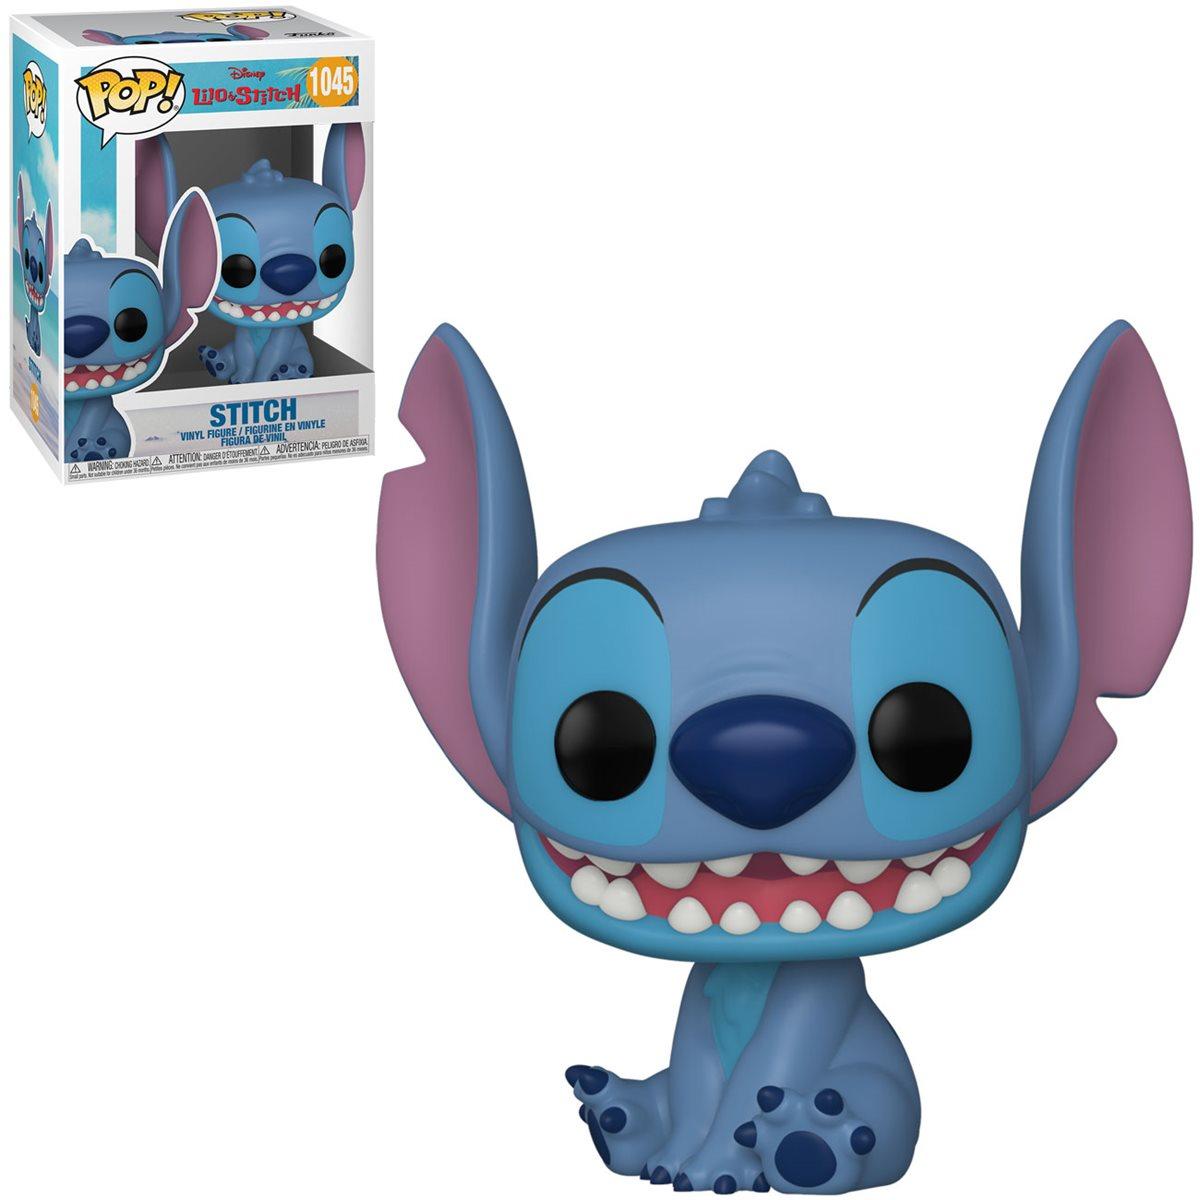 PRÉ VENDA: Funko Pop! Stitch Sentado e Sorrindo: Lilo & Stitch Disney #1045 - Funko